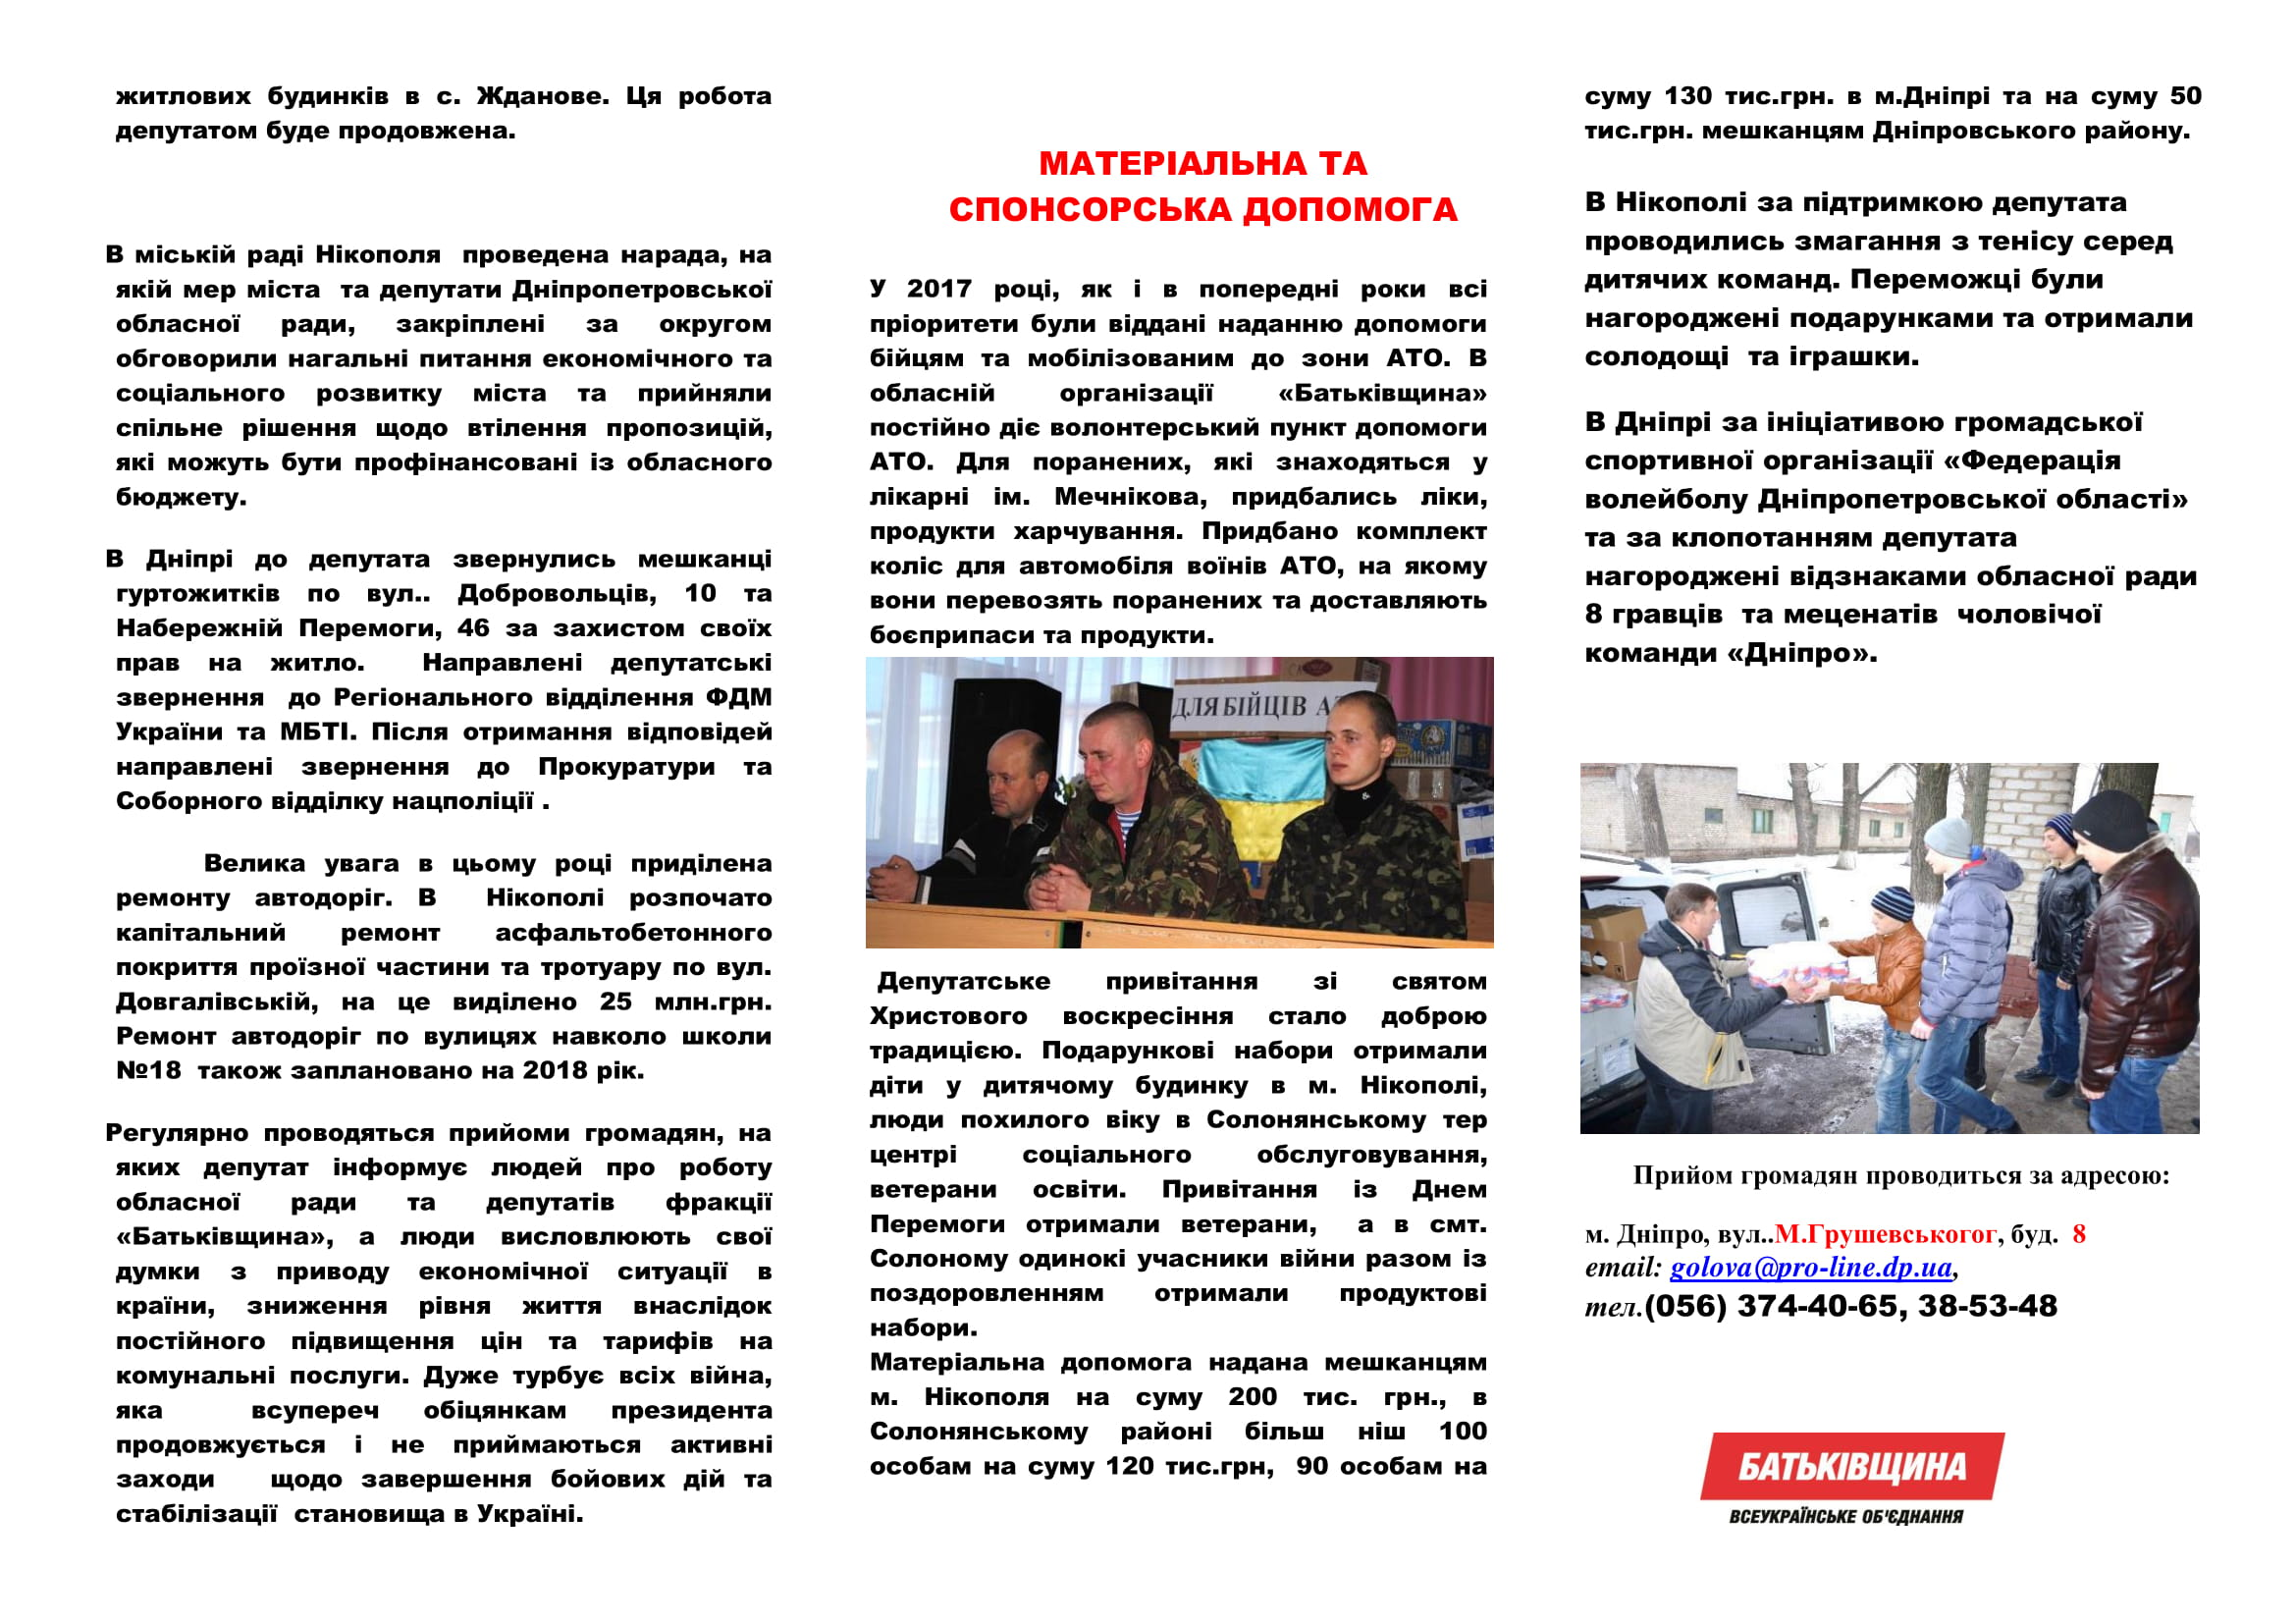 звіт-Ульяхіної-А.Н.-1-2